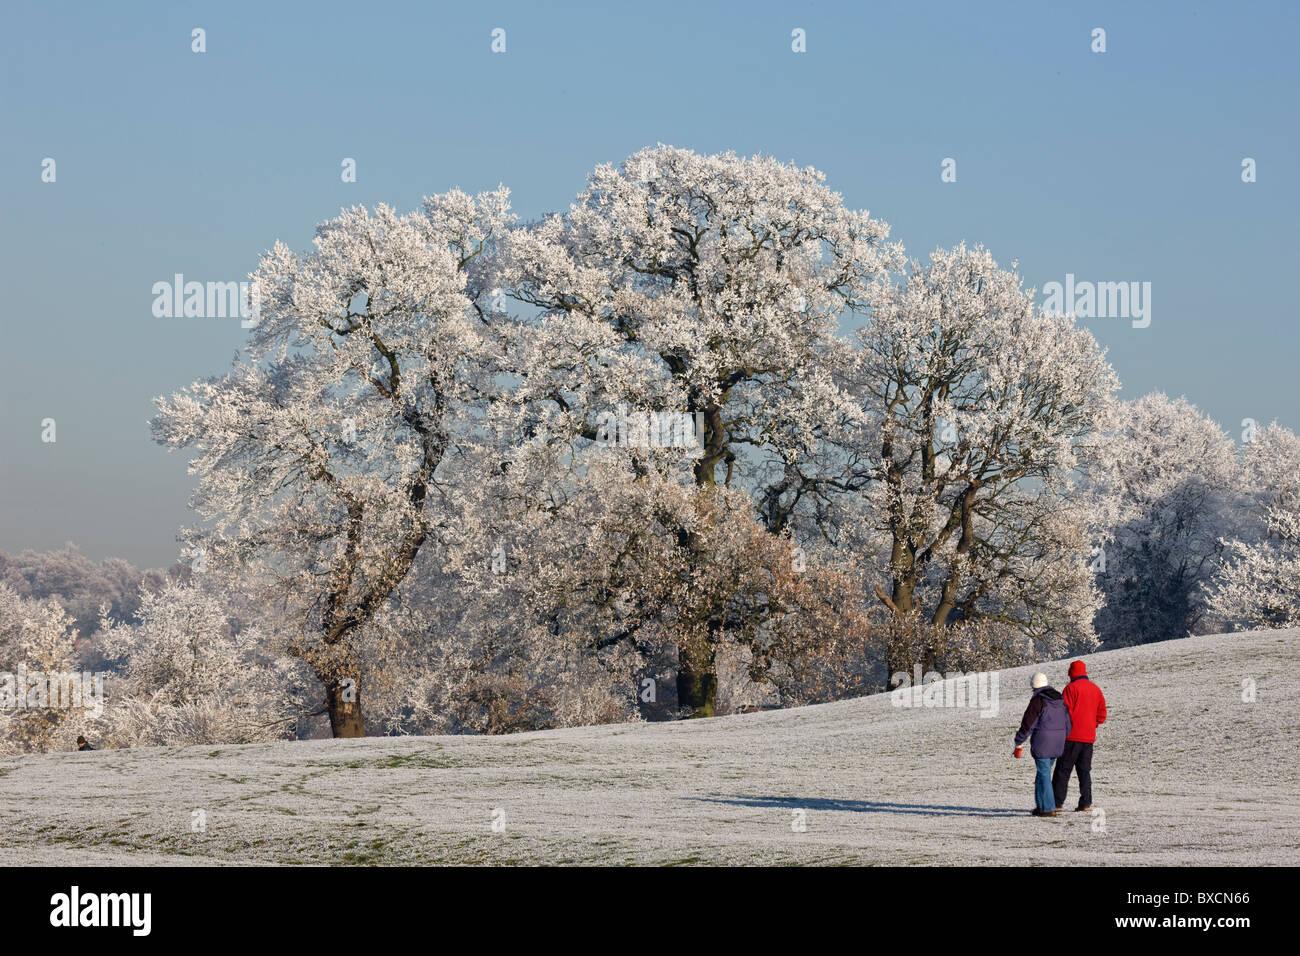 Hoarfrost on trees - United Kingdom - Stock Image